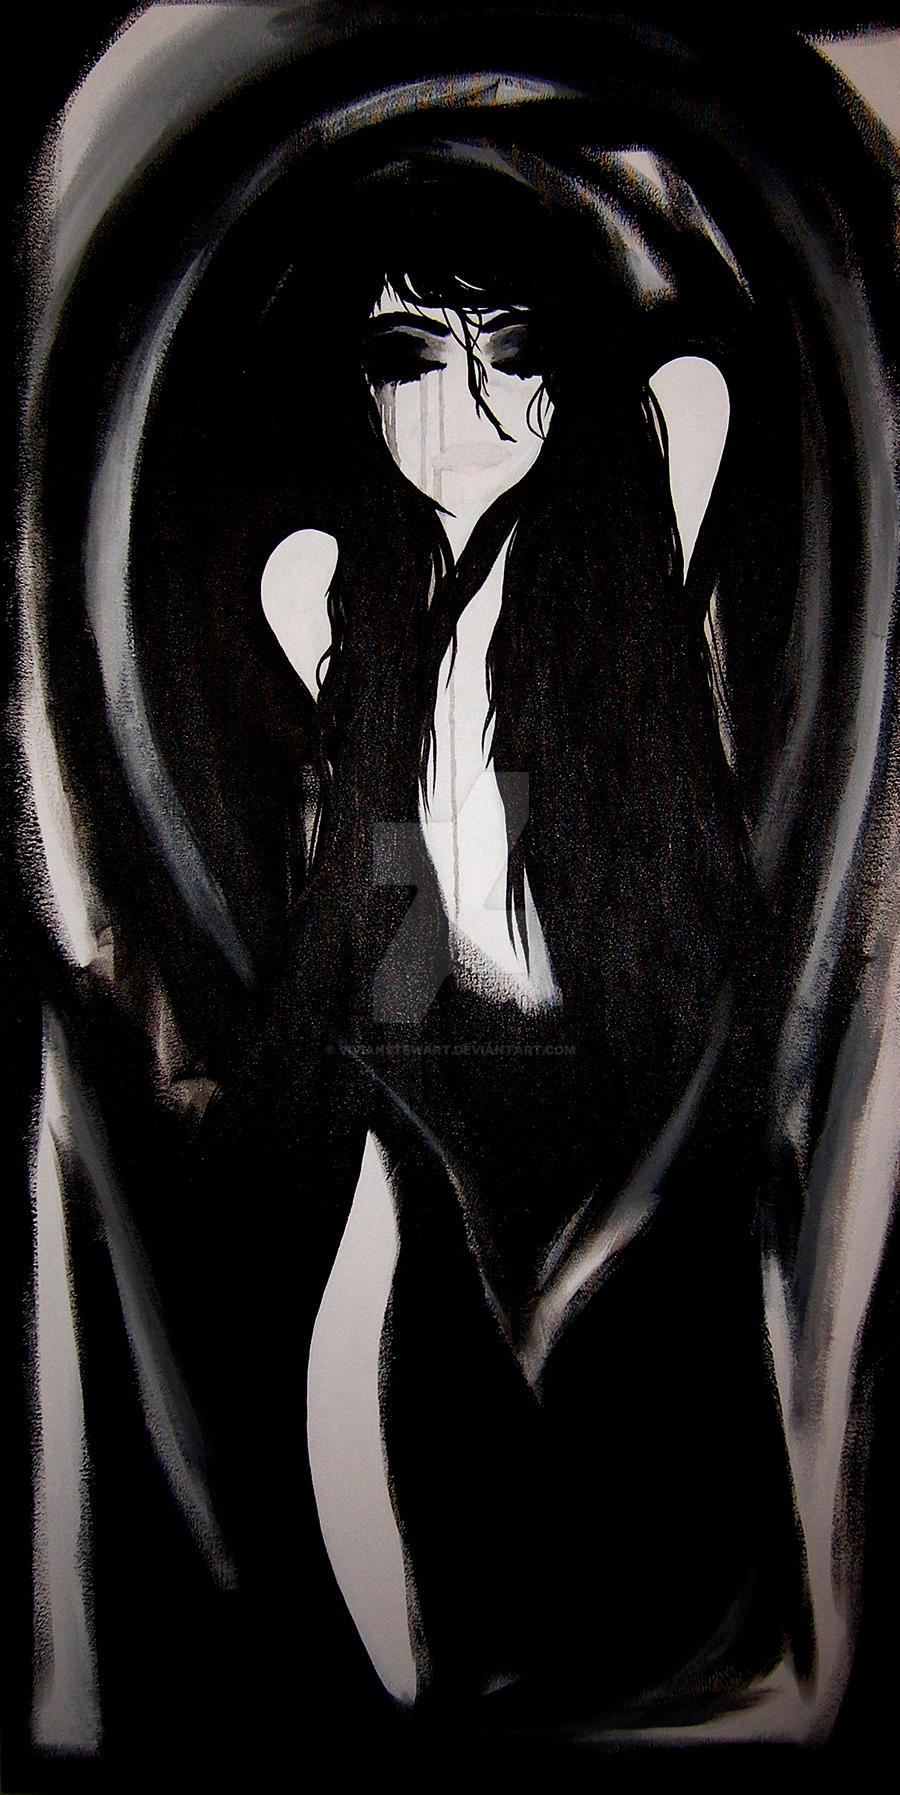 Black and White Woman by VivianStewart